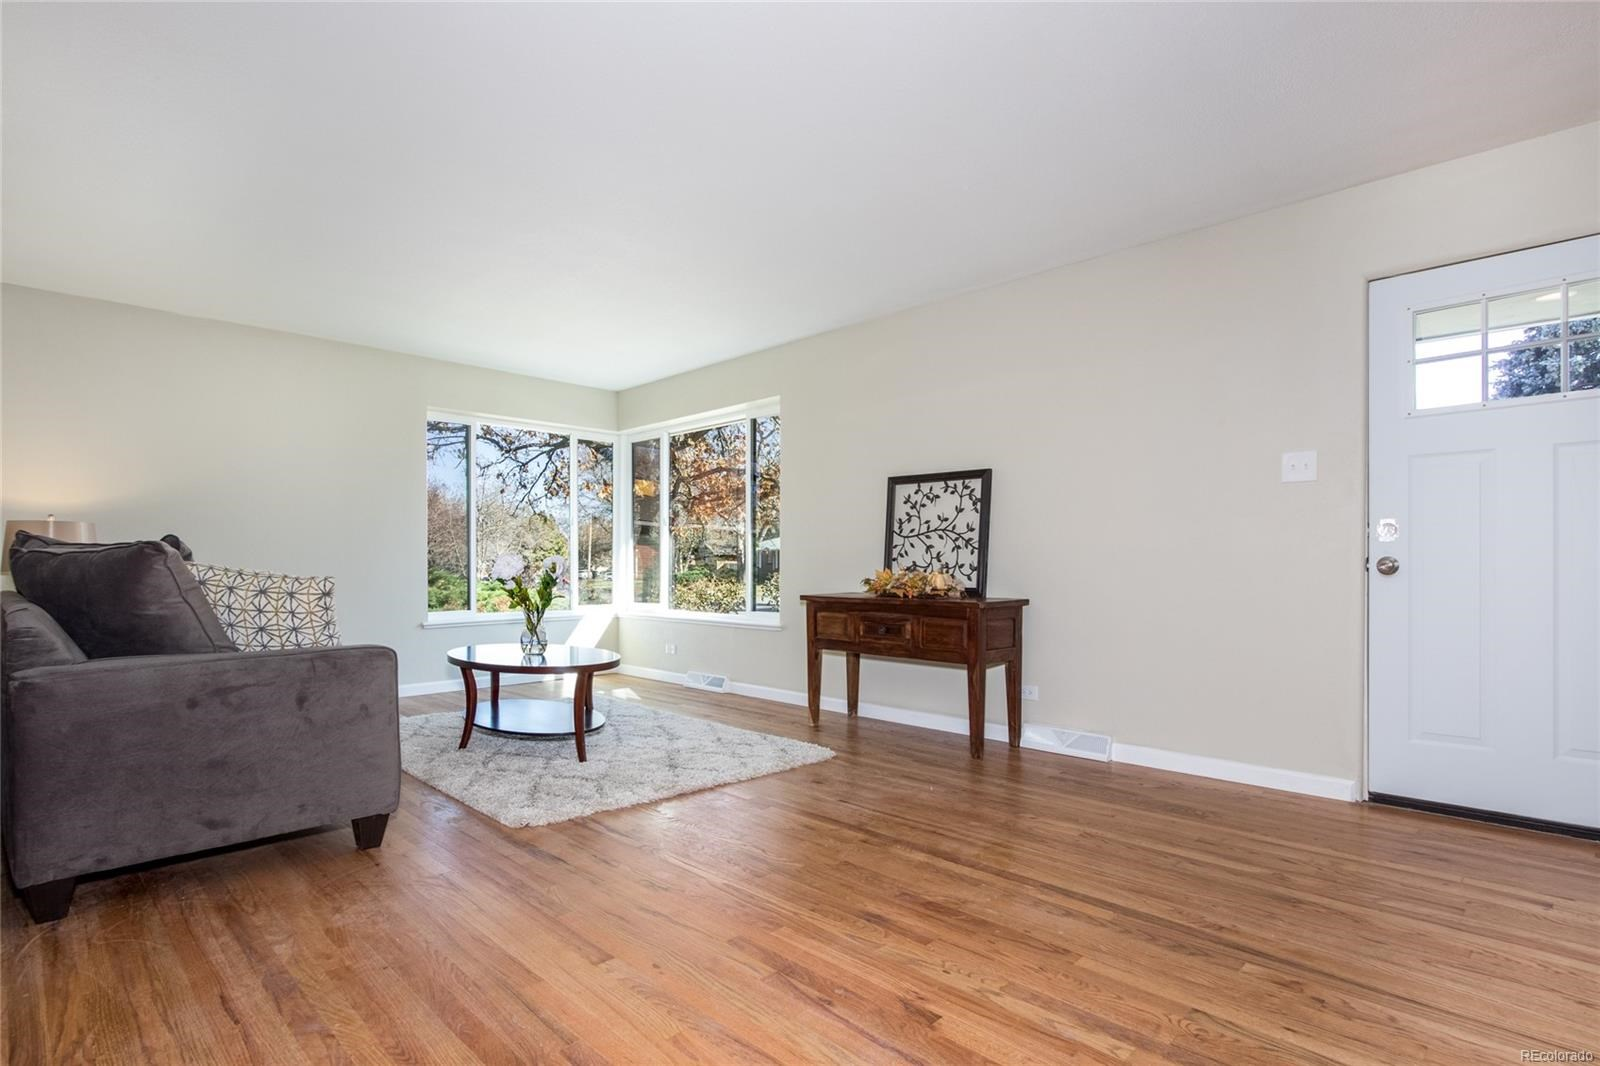 MLS# 3476335 - 4 - 9015 W 2nd Avenue, Lakewood, CO 80226